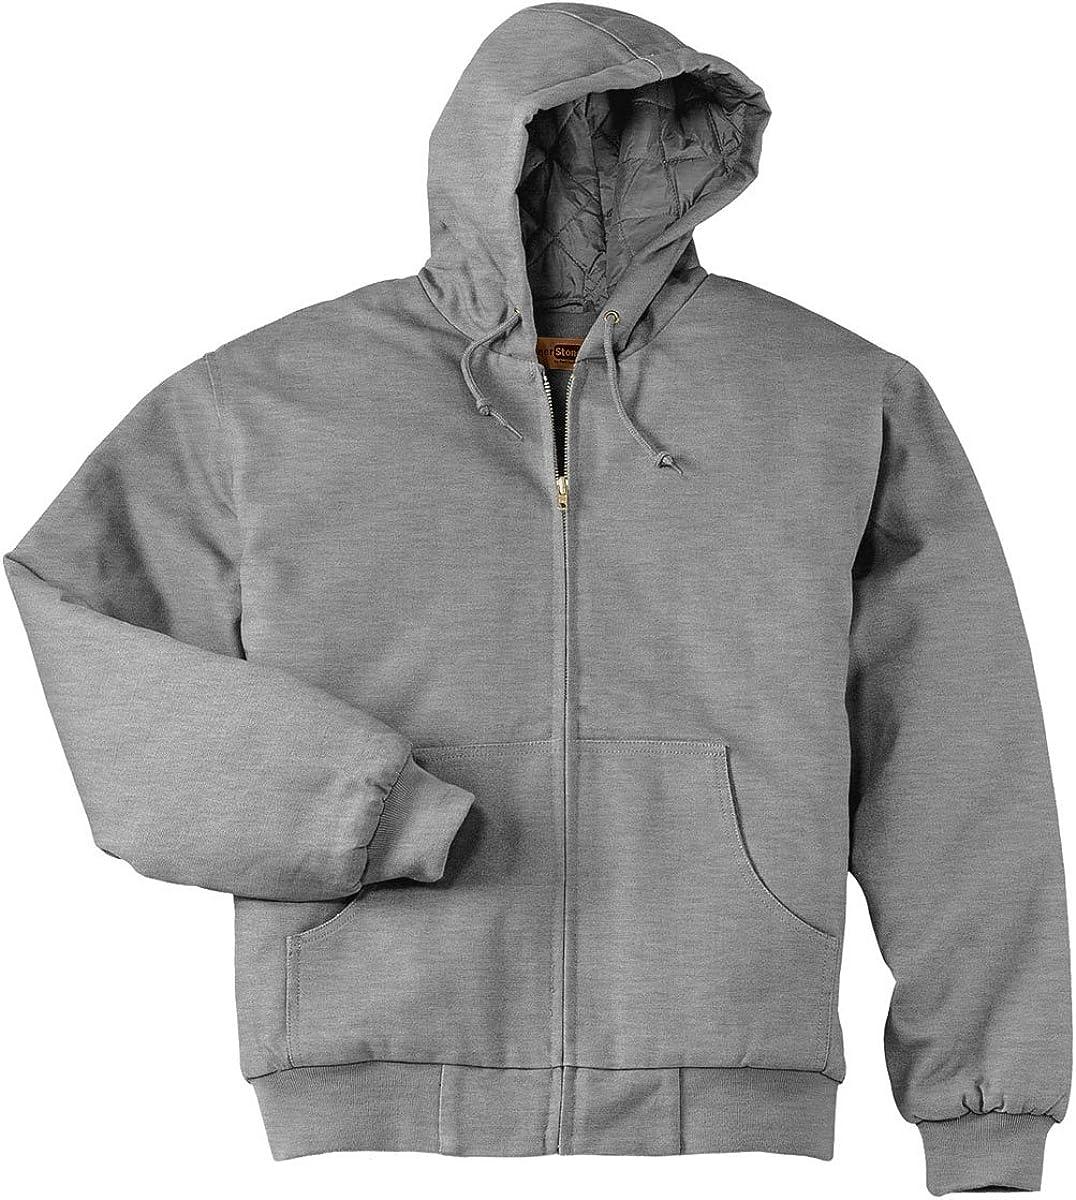 Cornerstone Heavyweight Full Zip Thermal Hooded Sweatshirt Japan Maker New Popular with